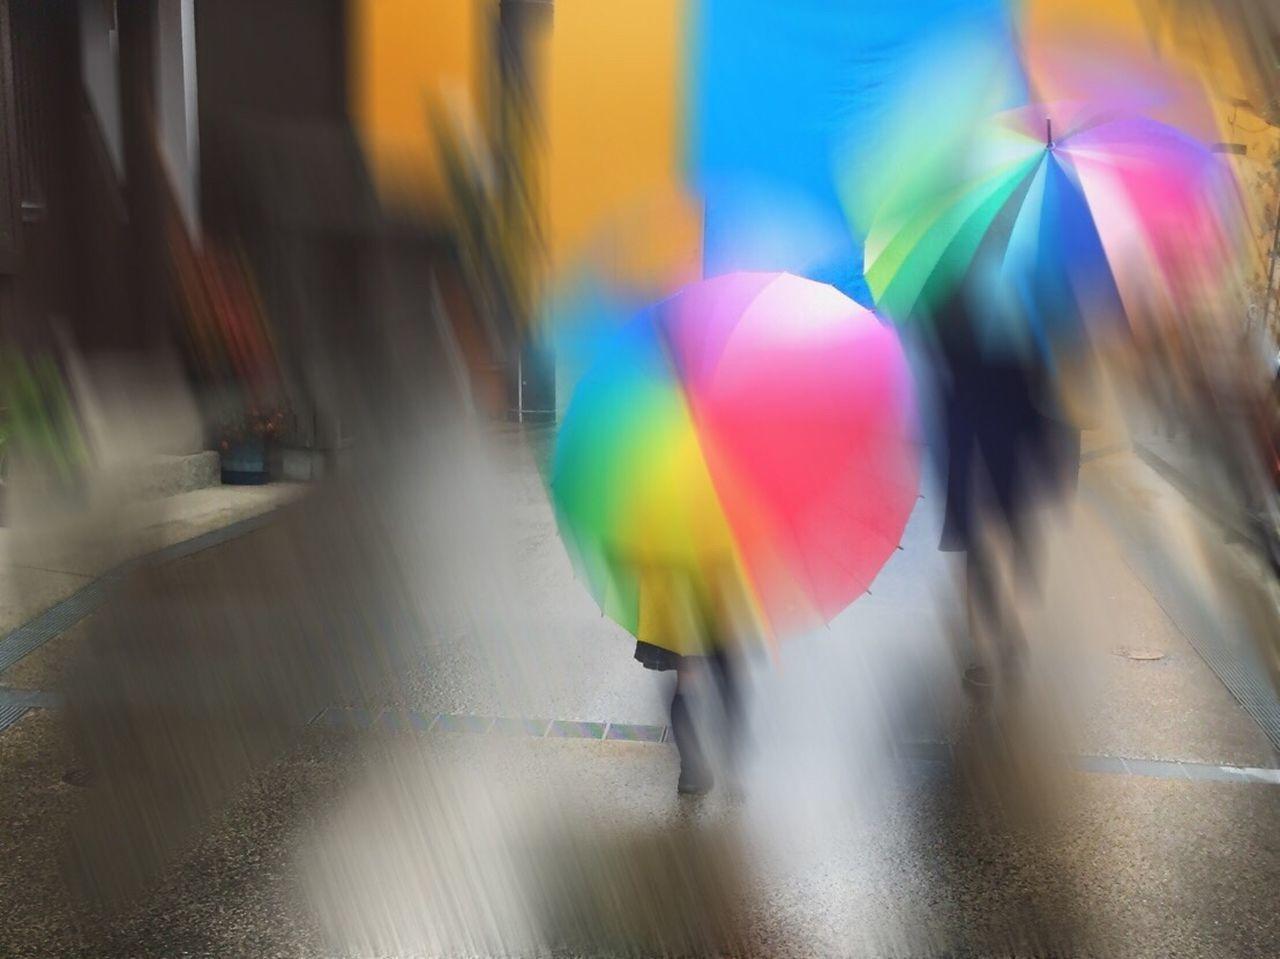 Real People Motion Japan Outdoors Street Photography Blurr Rainy Days Rainbow Umbrella